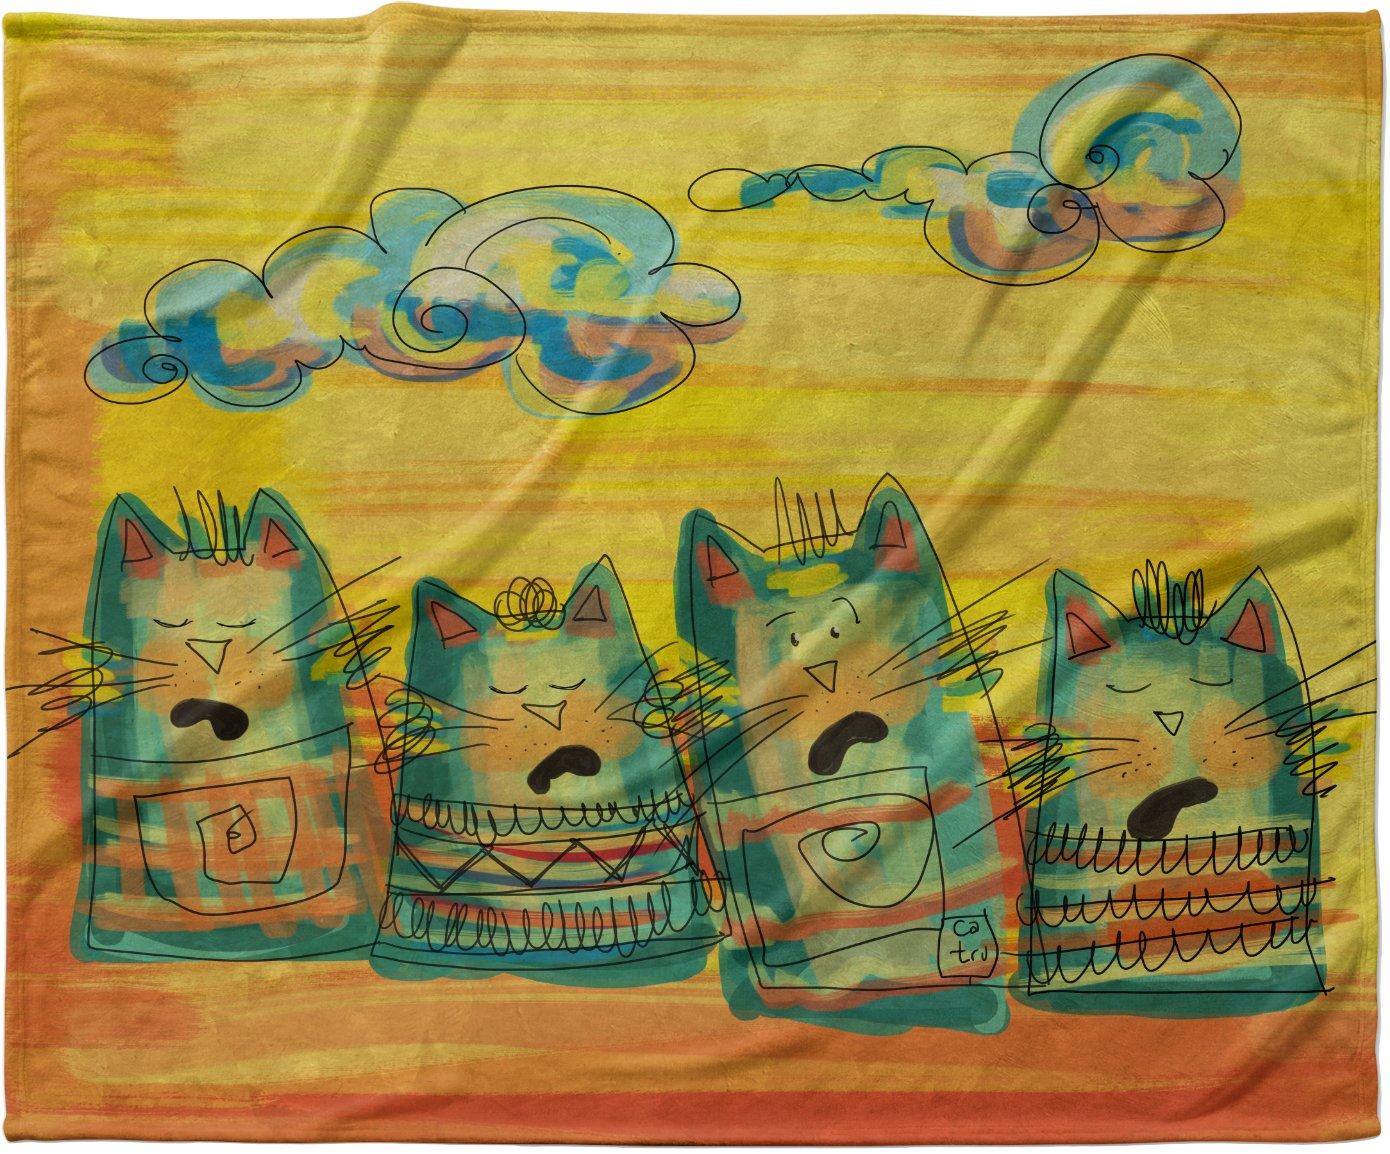 KESS InHouse Carina Povarchik 'Singing Cats' Yellow Orange Fleece Baby Blanket, 40' x 30'